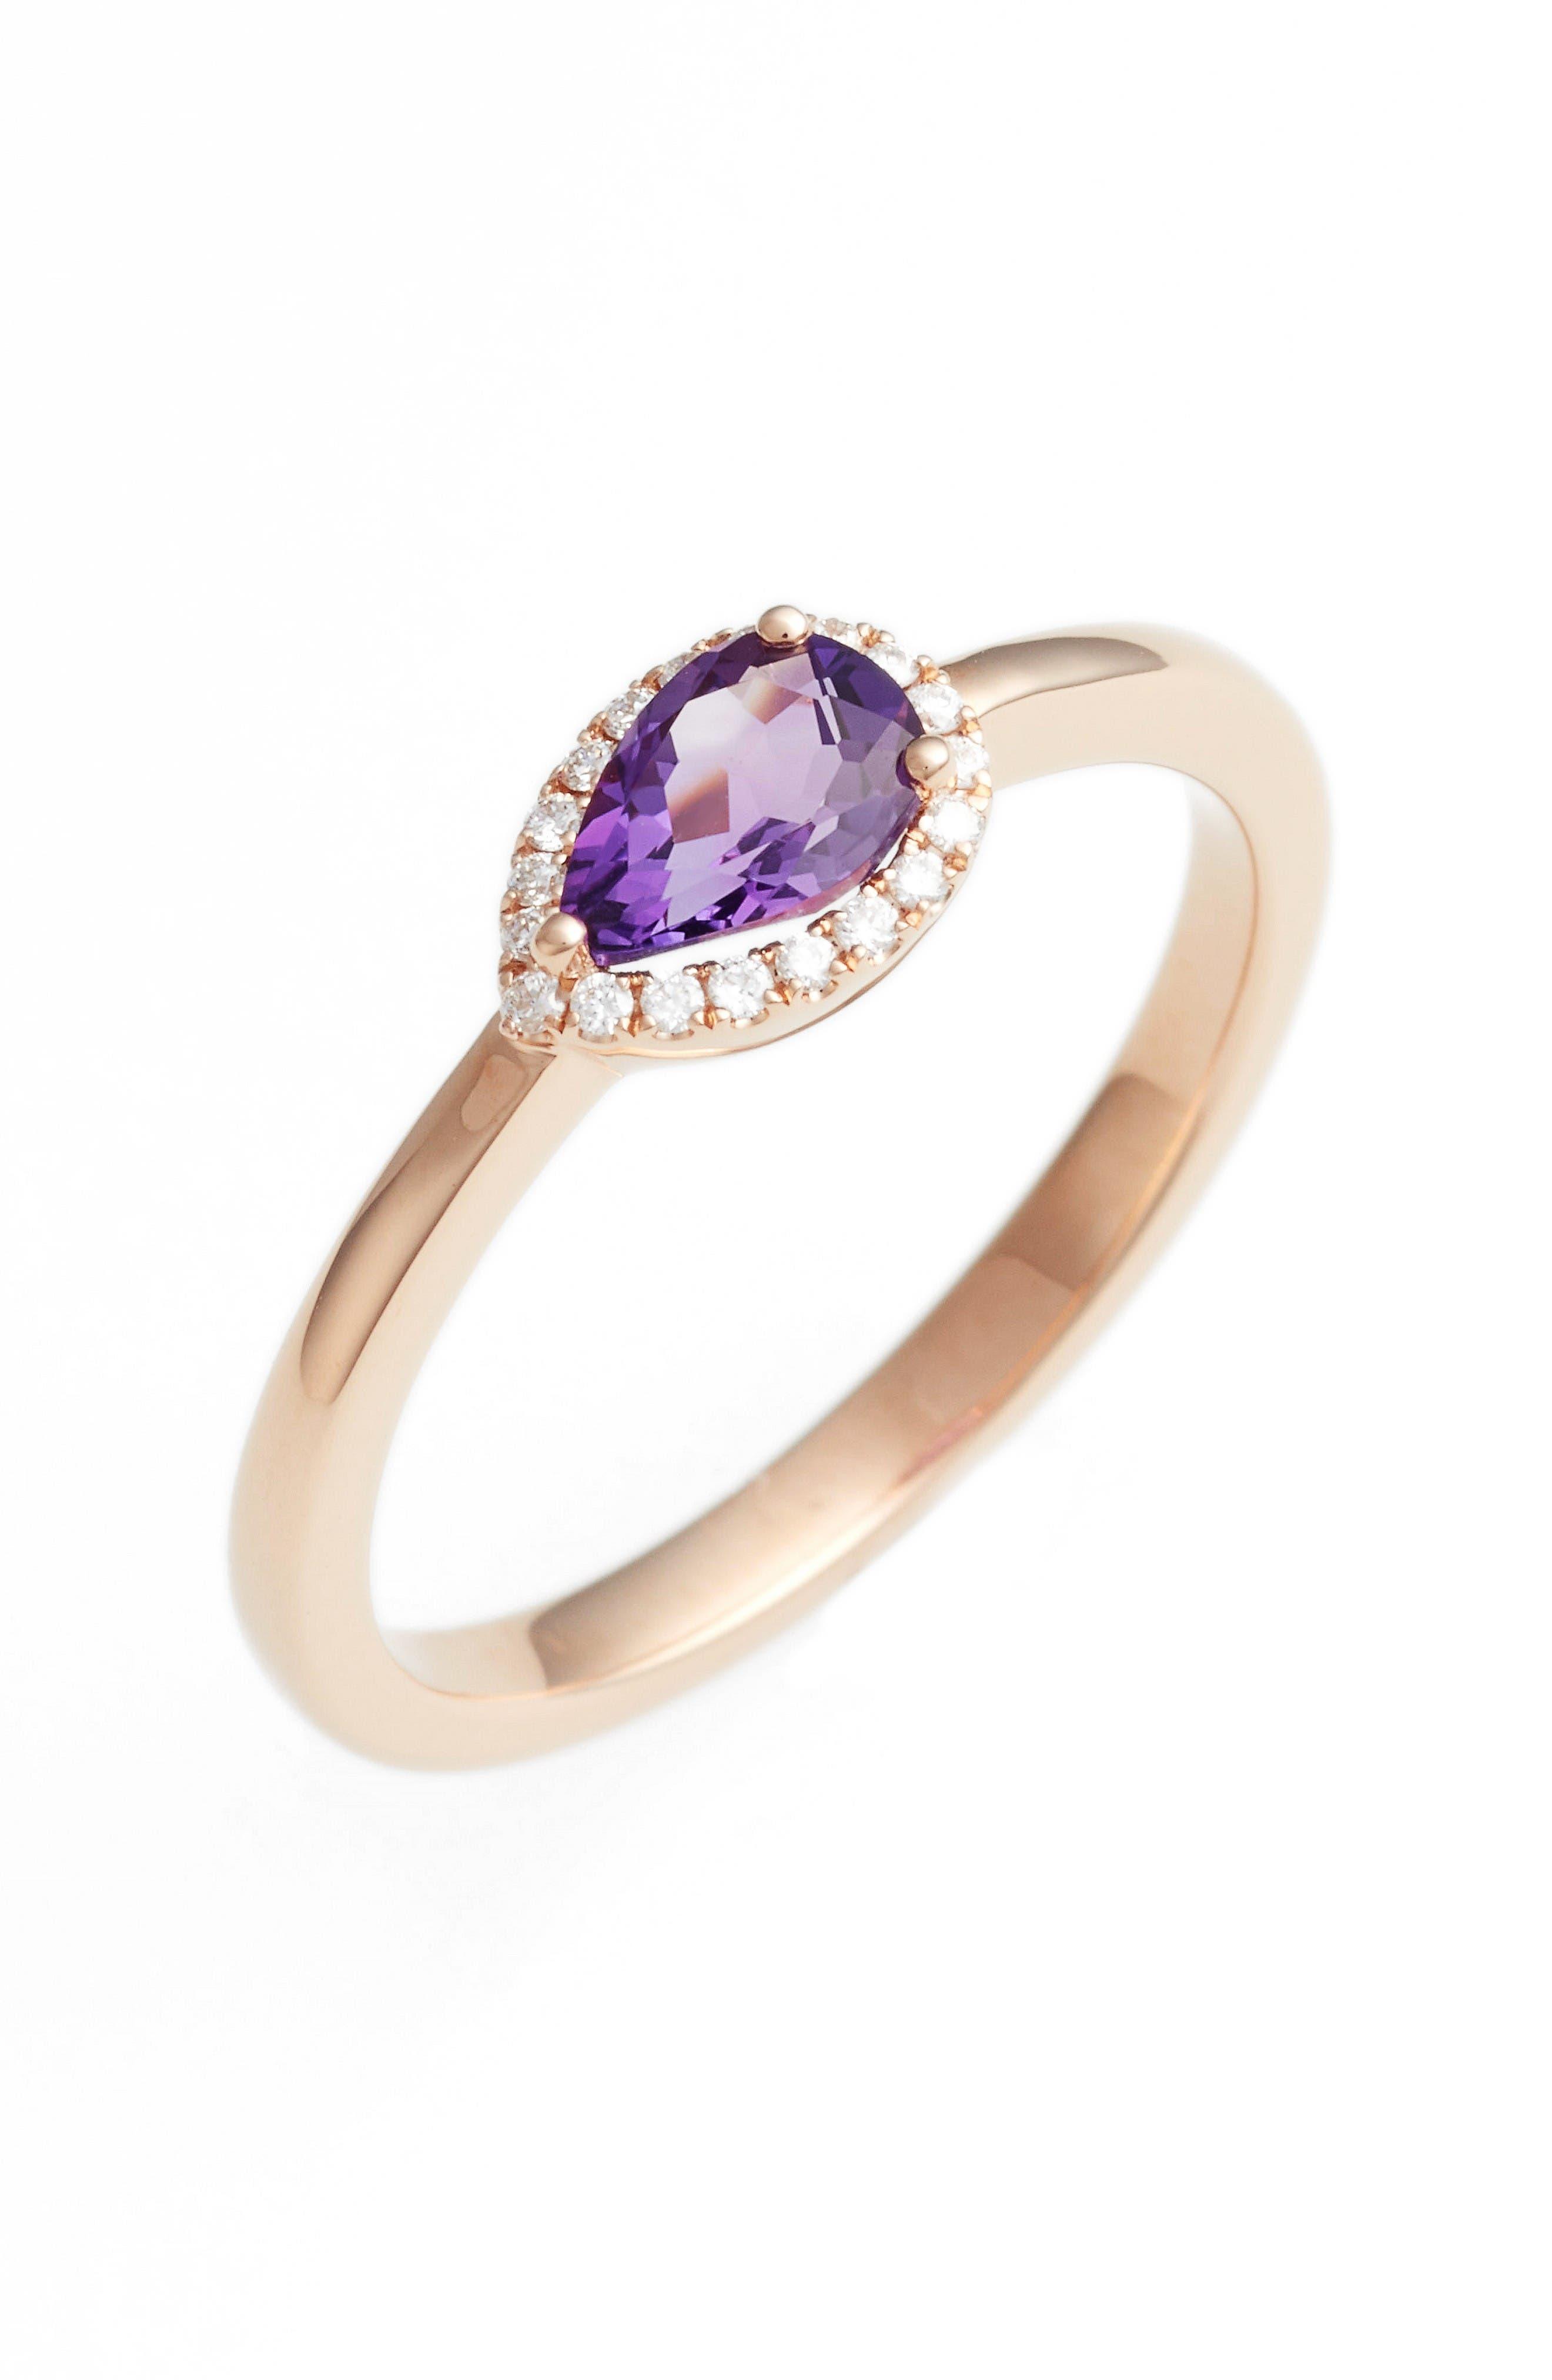 Iris Diamond & Semiprecious Stone Teardrop Ring,                         Main,                         color, Rose Gold/ Purple Amethyst